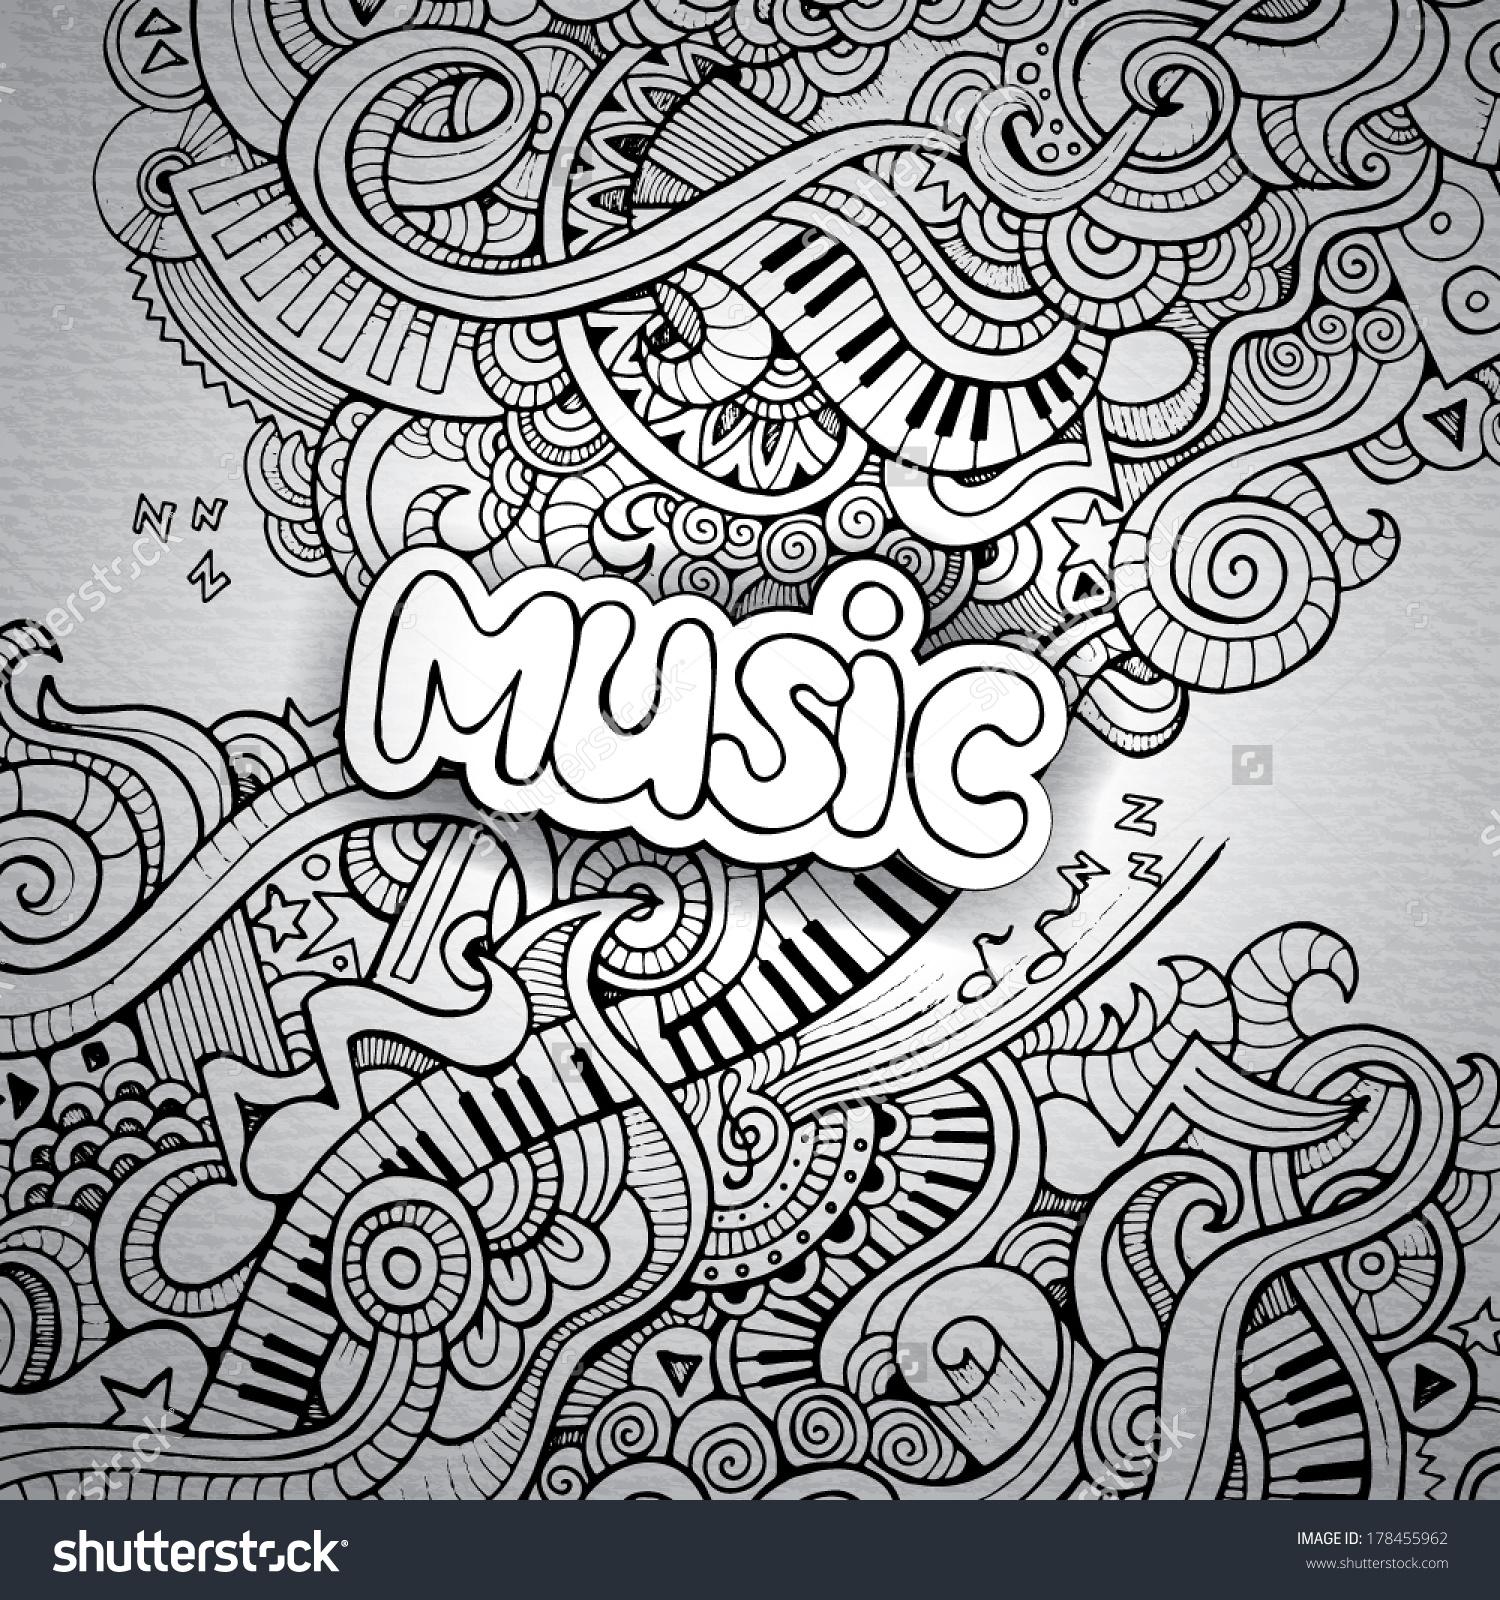 Drawn music doodle art Notebook doodle doodle Shutterstock :